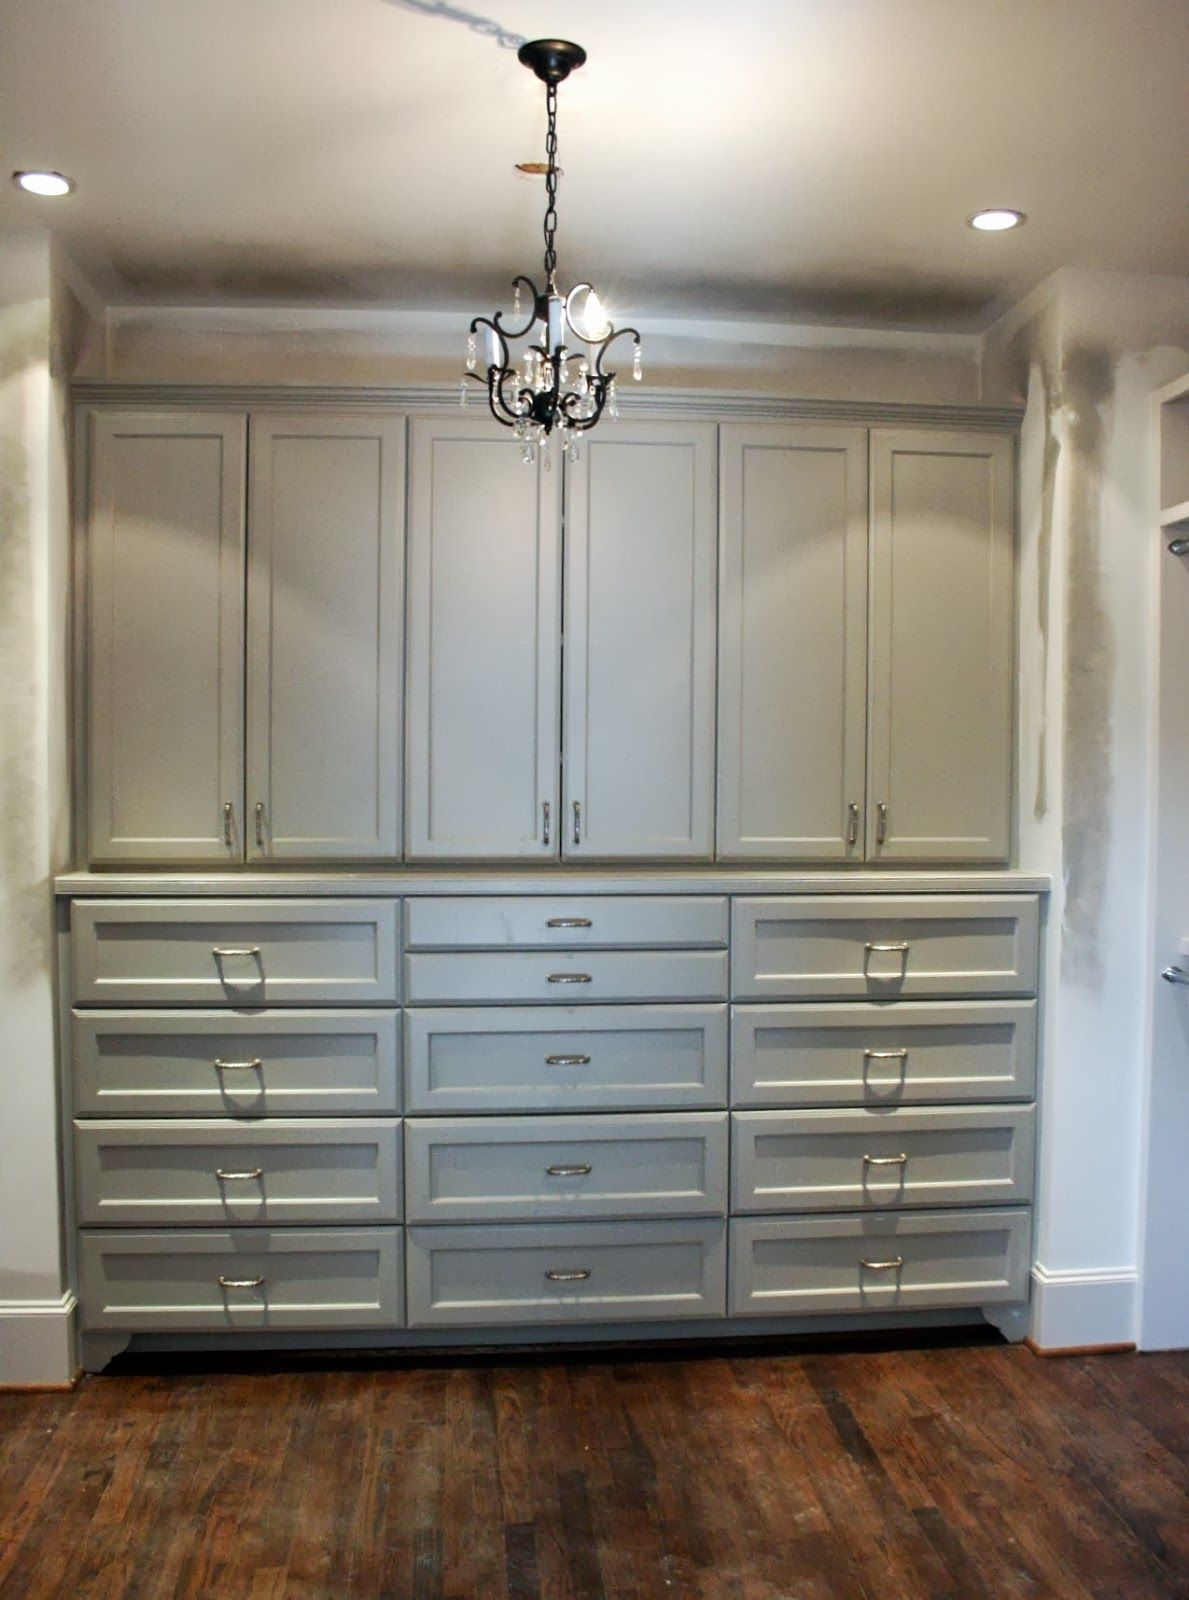 Master Bedroom Built In Cabinets Shelving